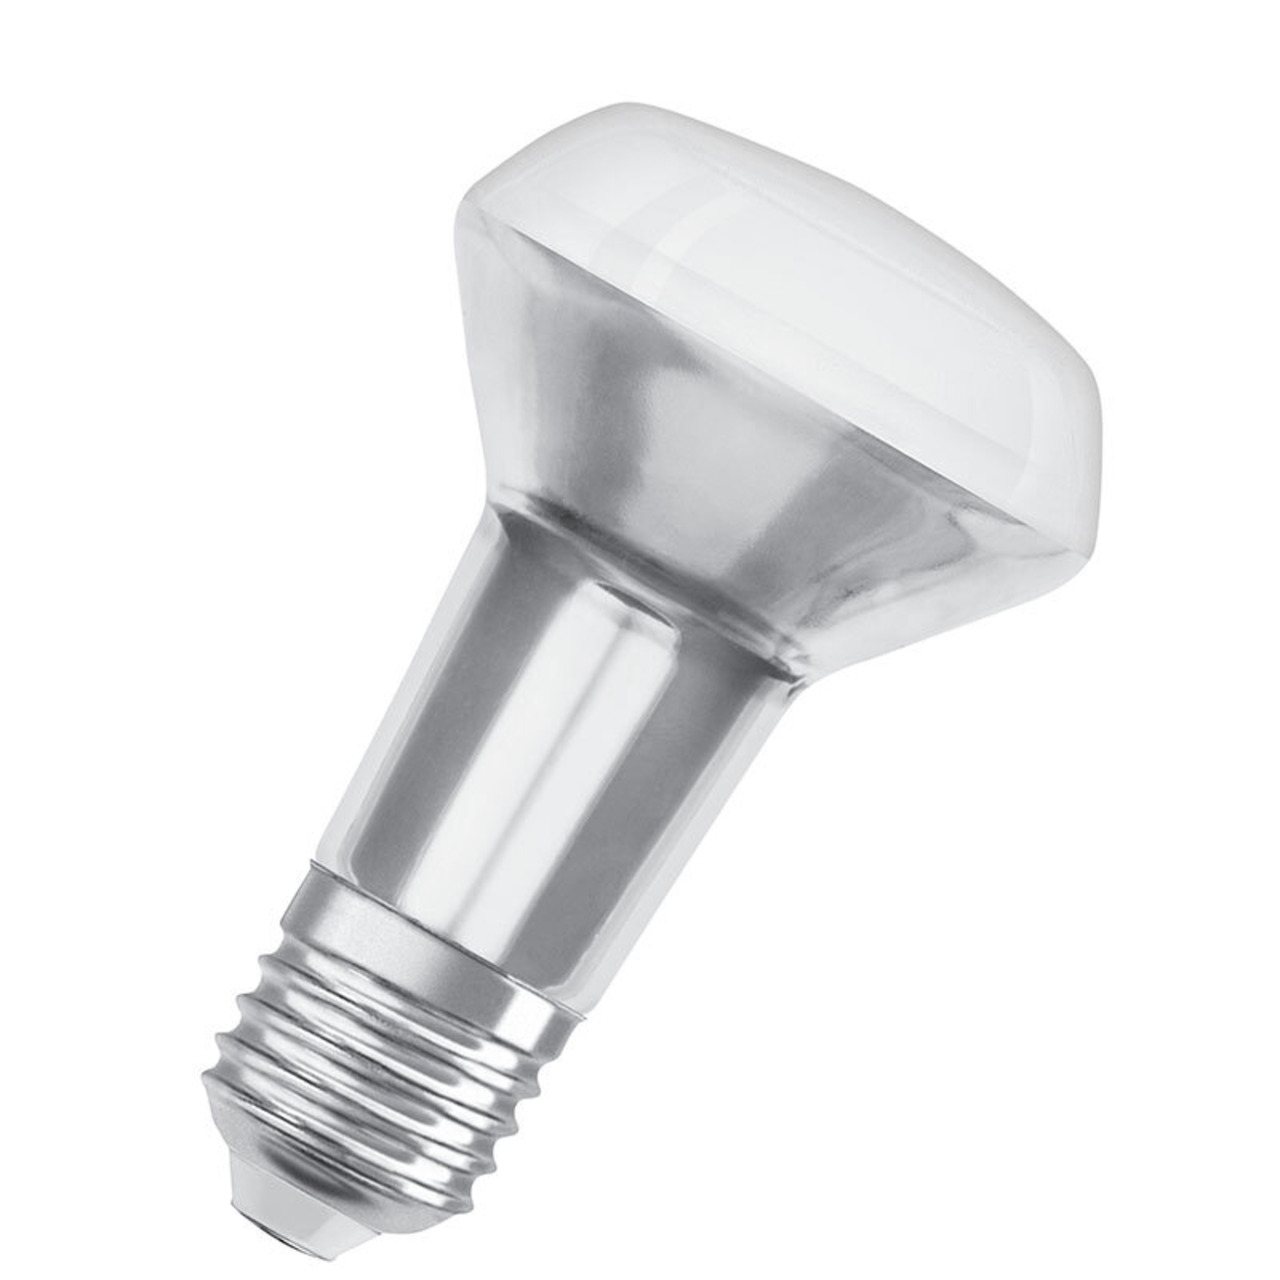 OSRAM LED SUPERSTAR 5-9-W-R63-LED-Reflektorlampe E27- warmweiund-223 - 90 Ra- dimmbar